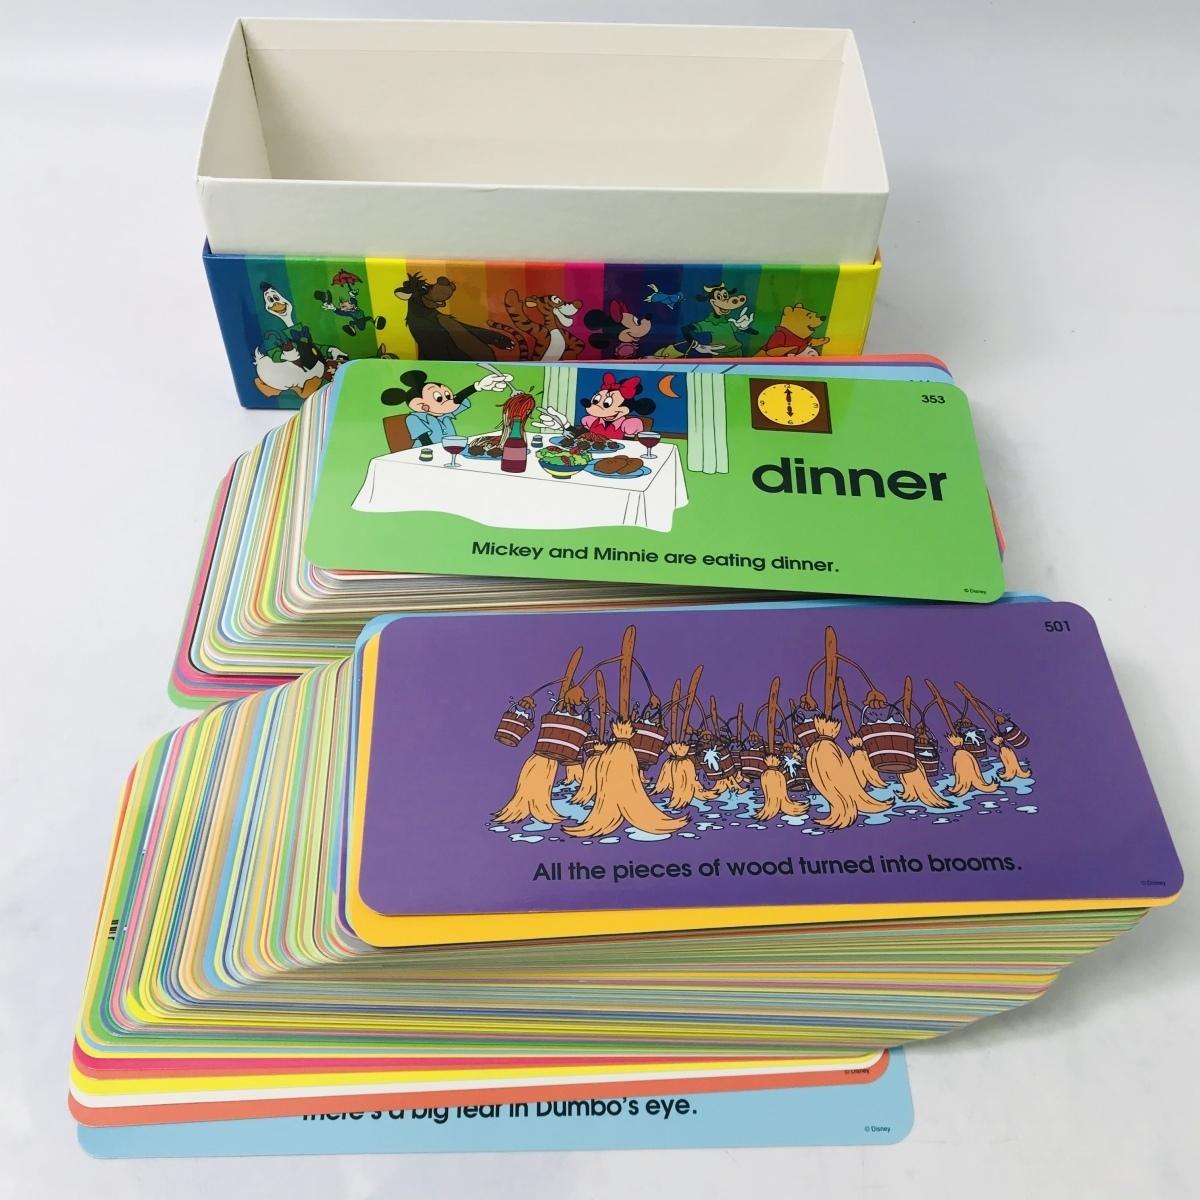 Disney World English DWE ワールド イングリッシュ DVD CD PLAYMATE カード 等 セット_画像10